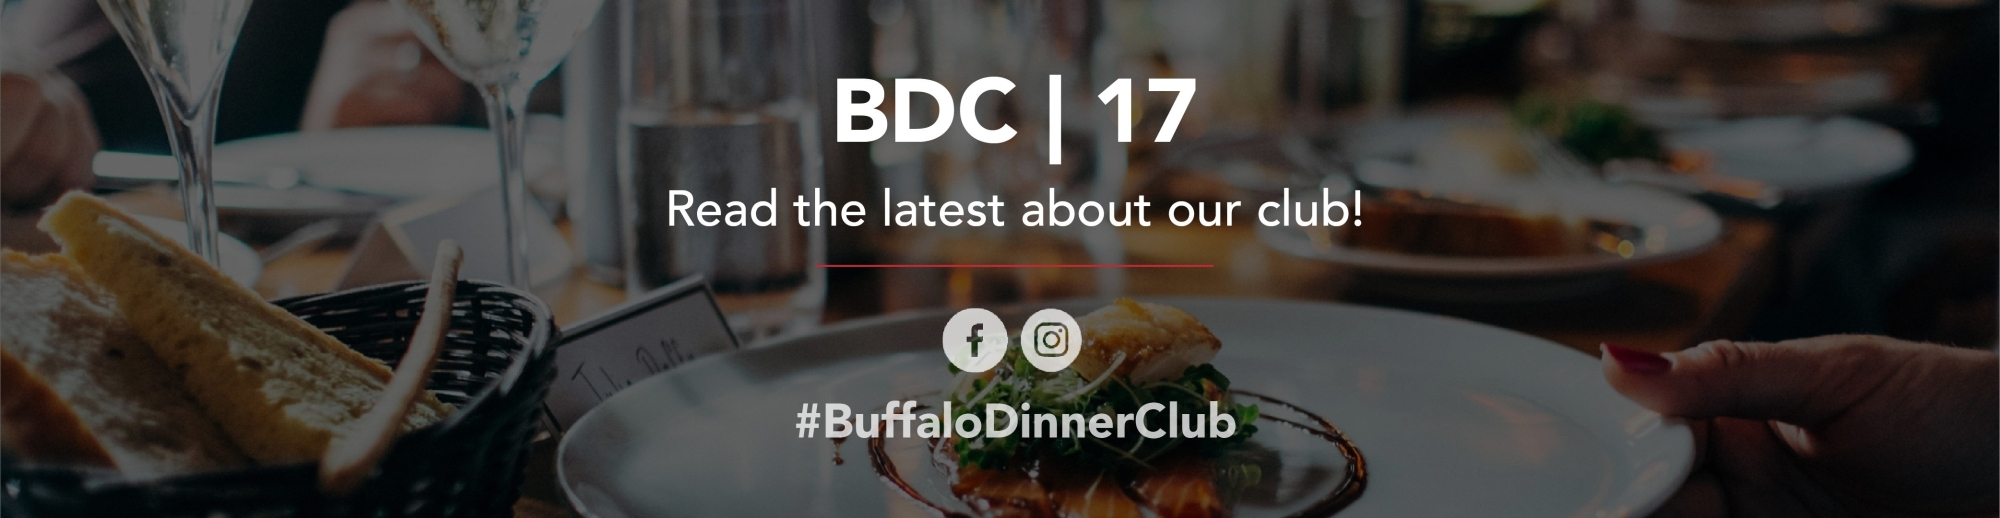 buffalo-dinner-club-blog-banner